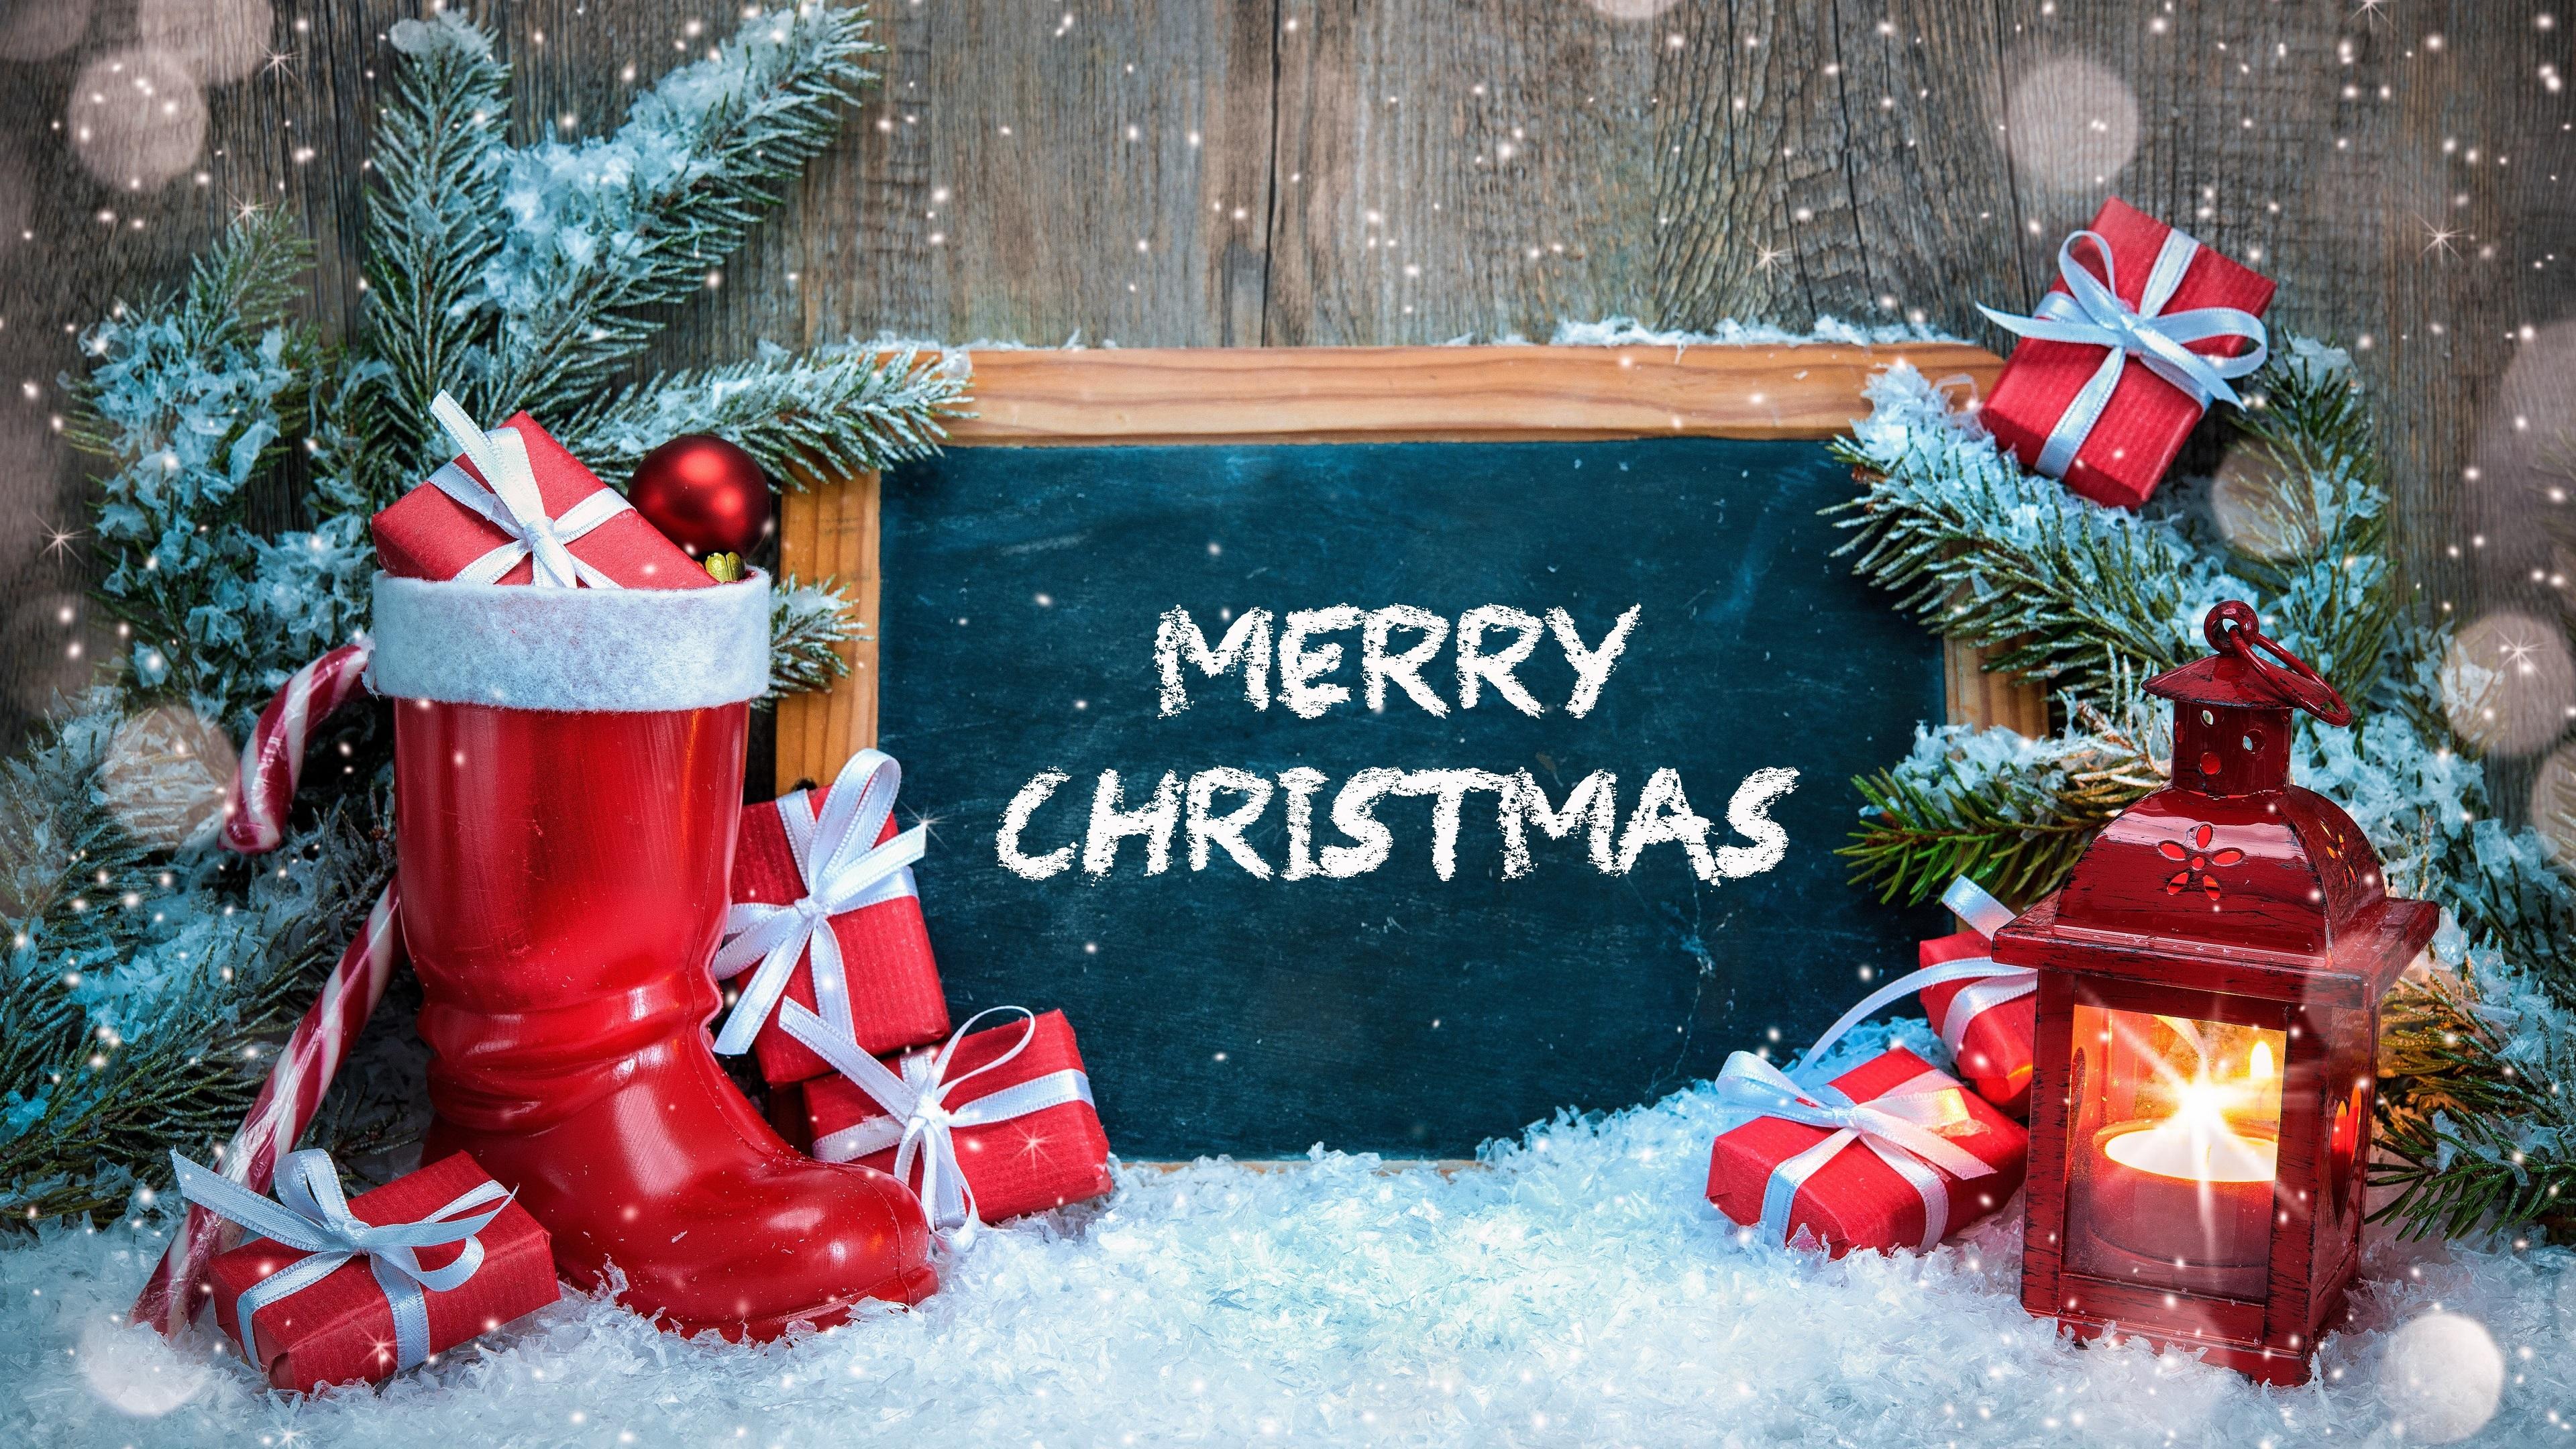 Best Christmas 4k Wallpapers 3840x2160